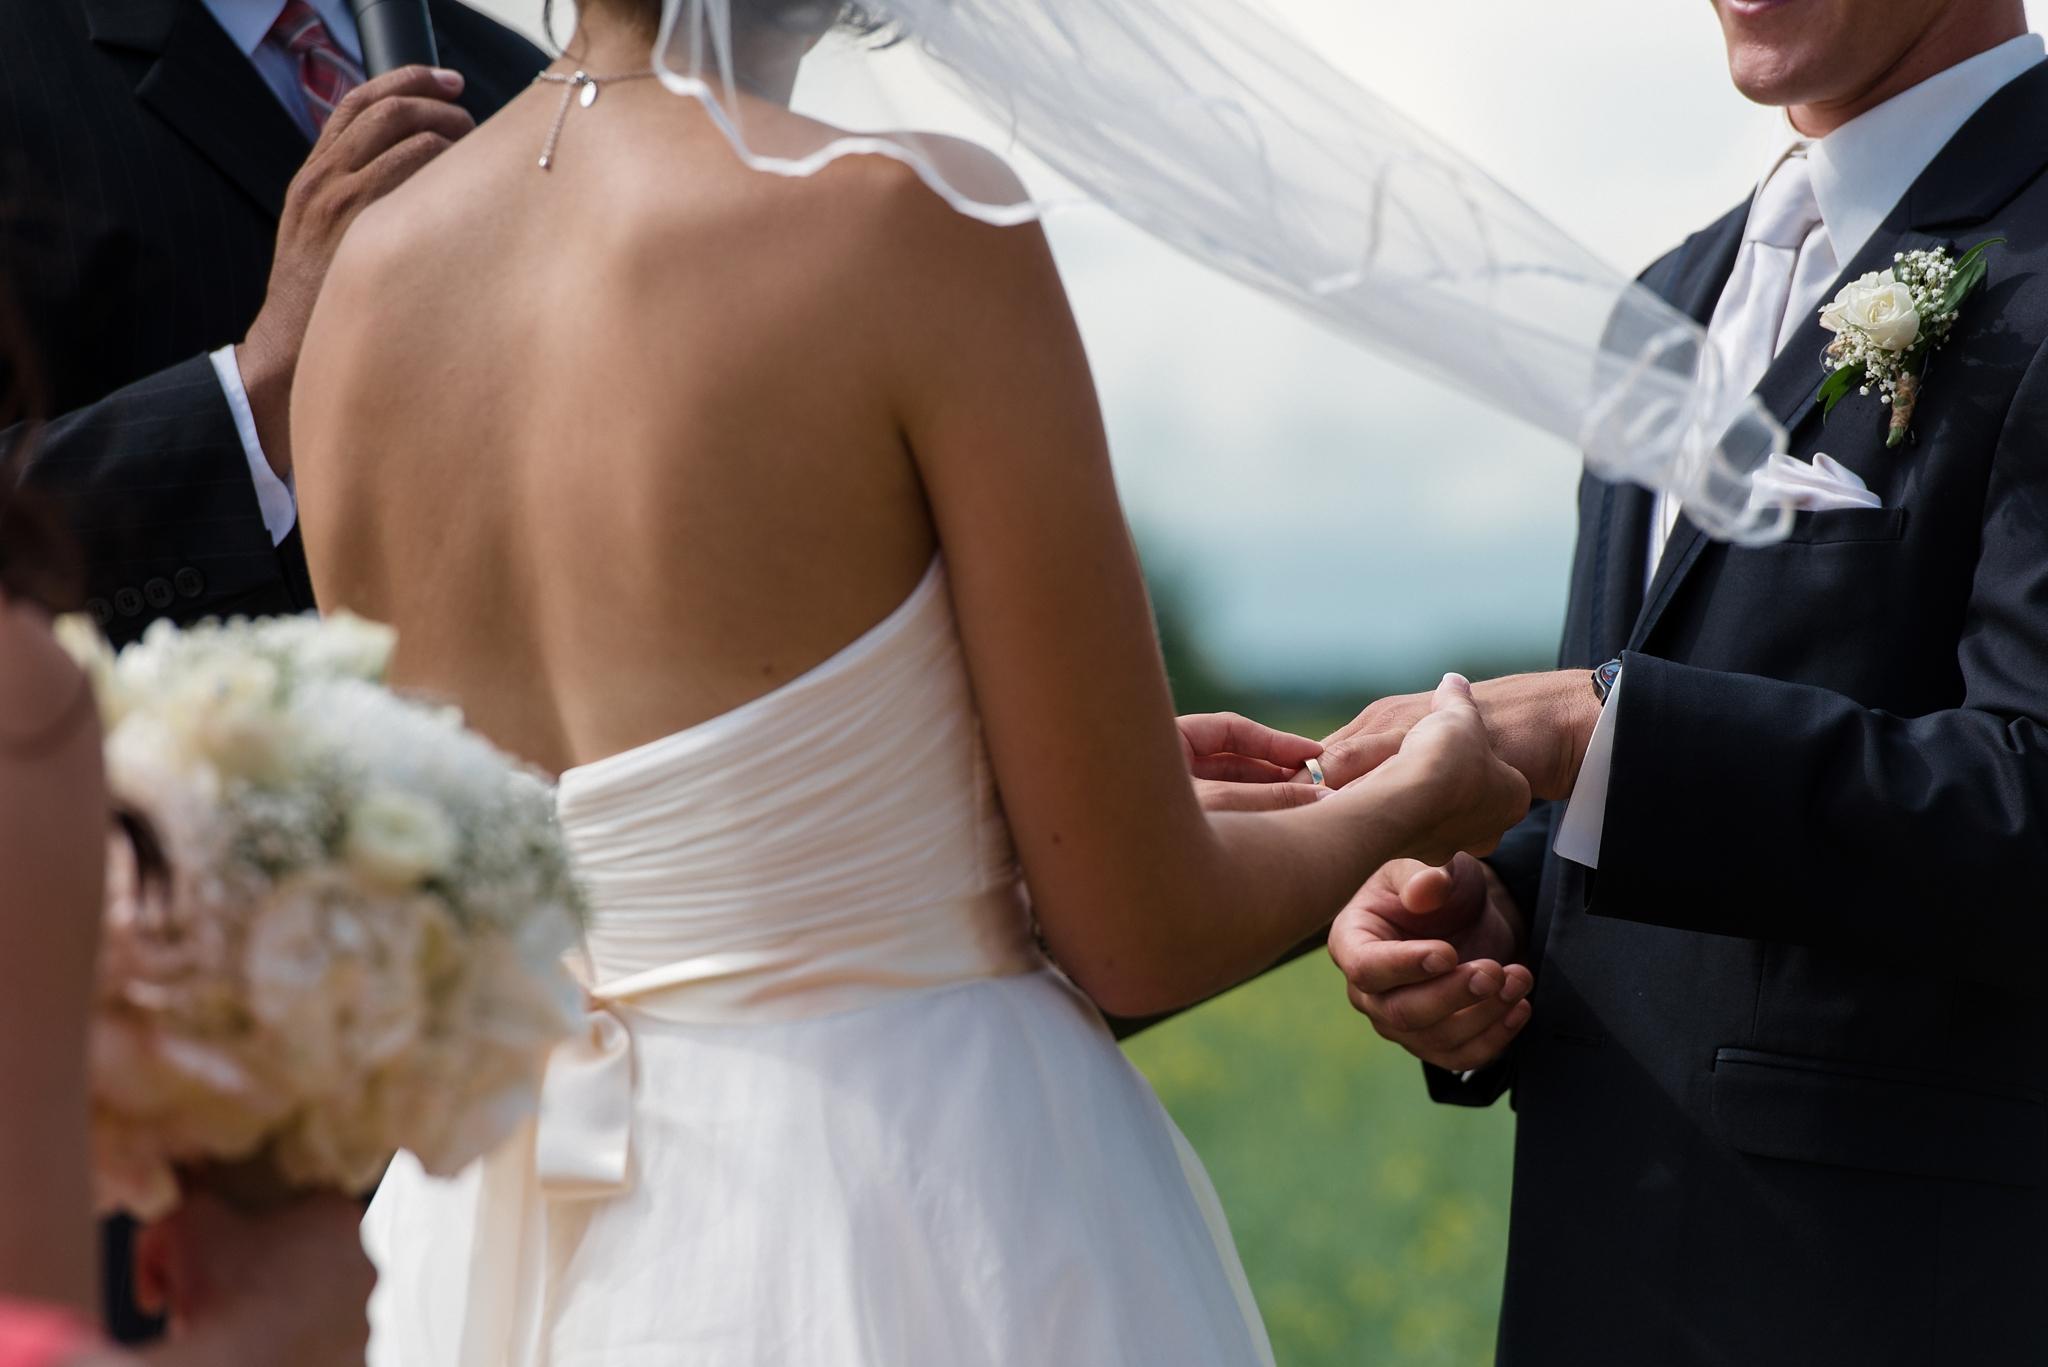 kaihla_tonai_intimate_wedding_elopement_photographer_0053